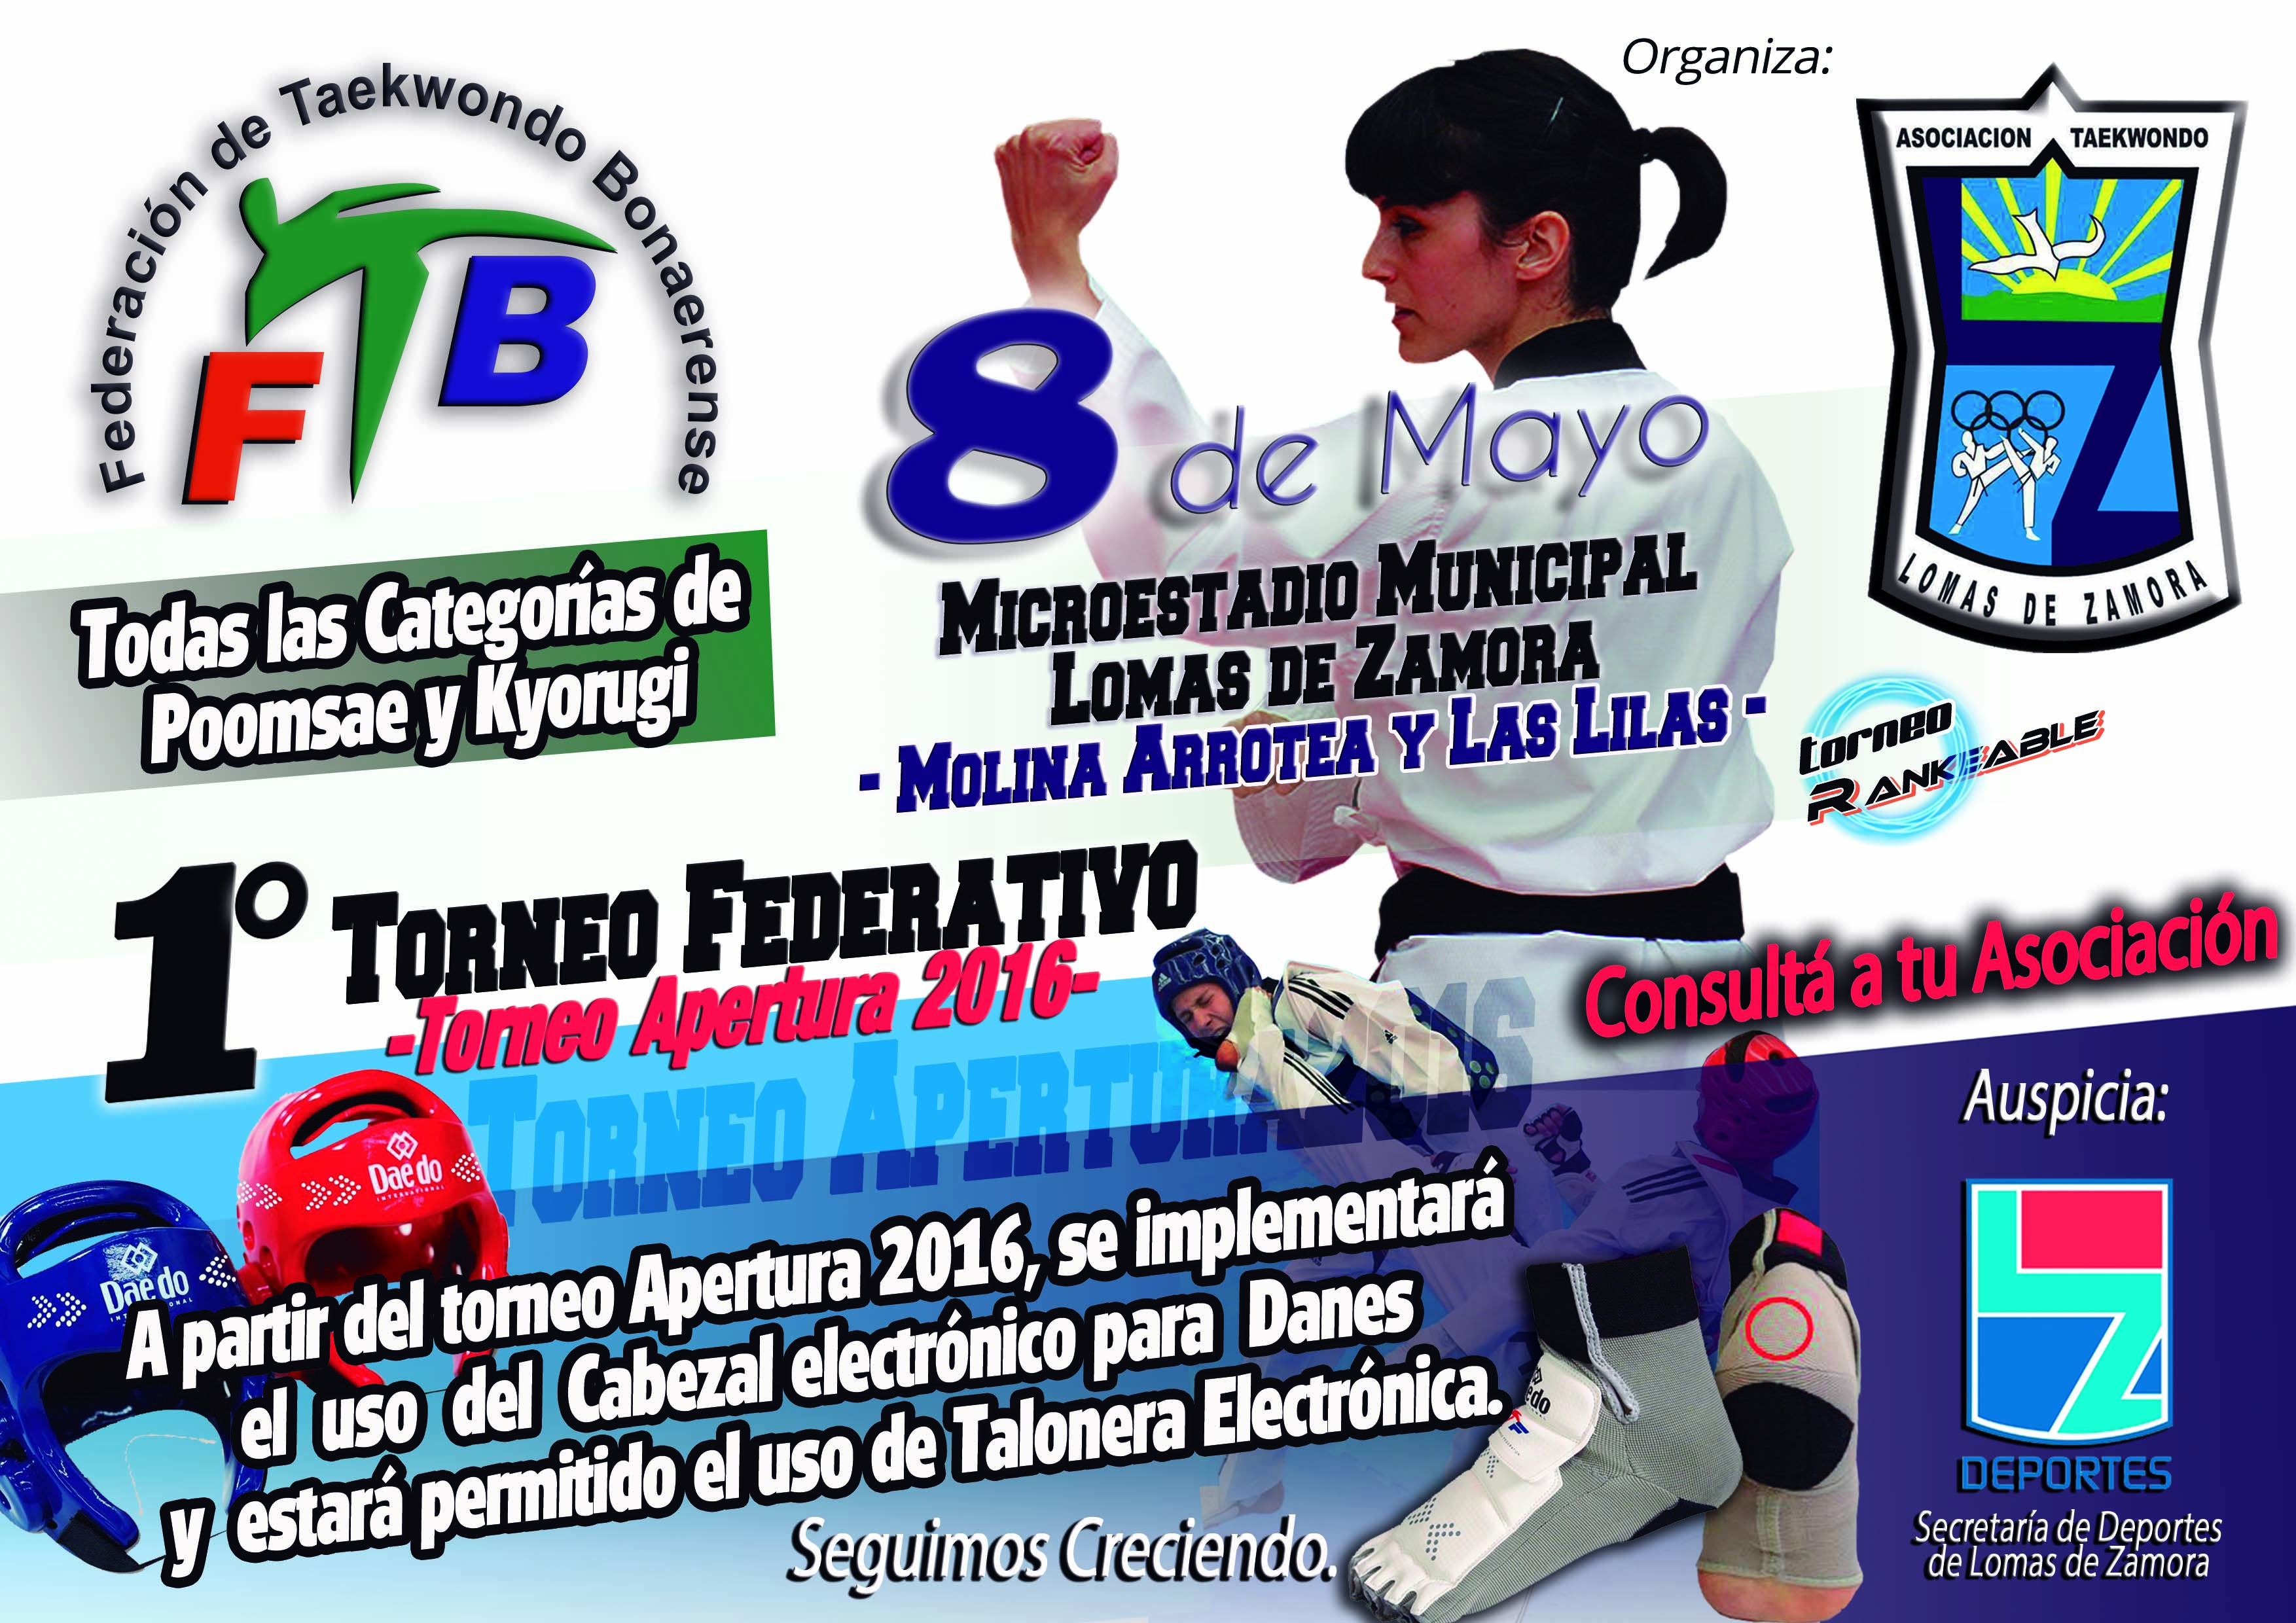 torneo_apertura_2016_cabezal_electronico